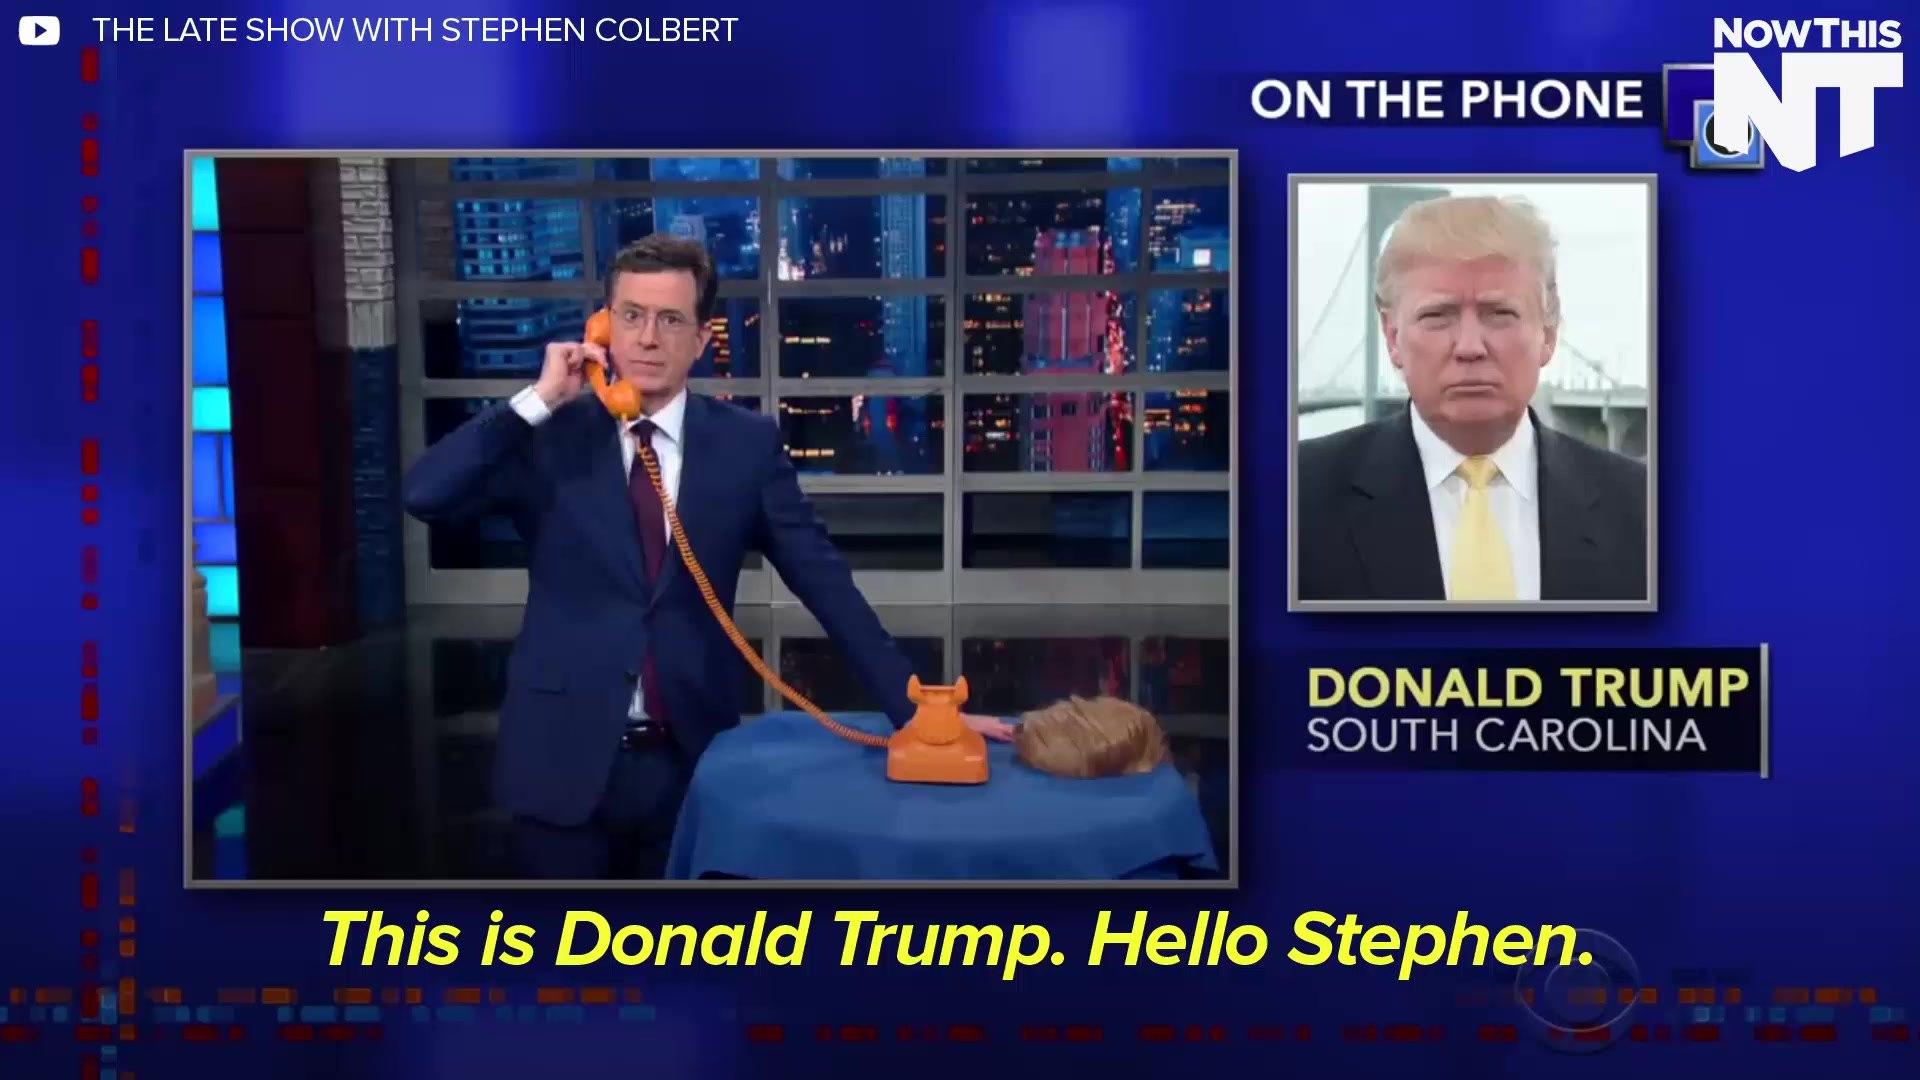 Trump Calls Stephen Colbert On The 'Trump Phone'